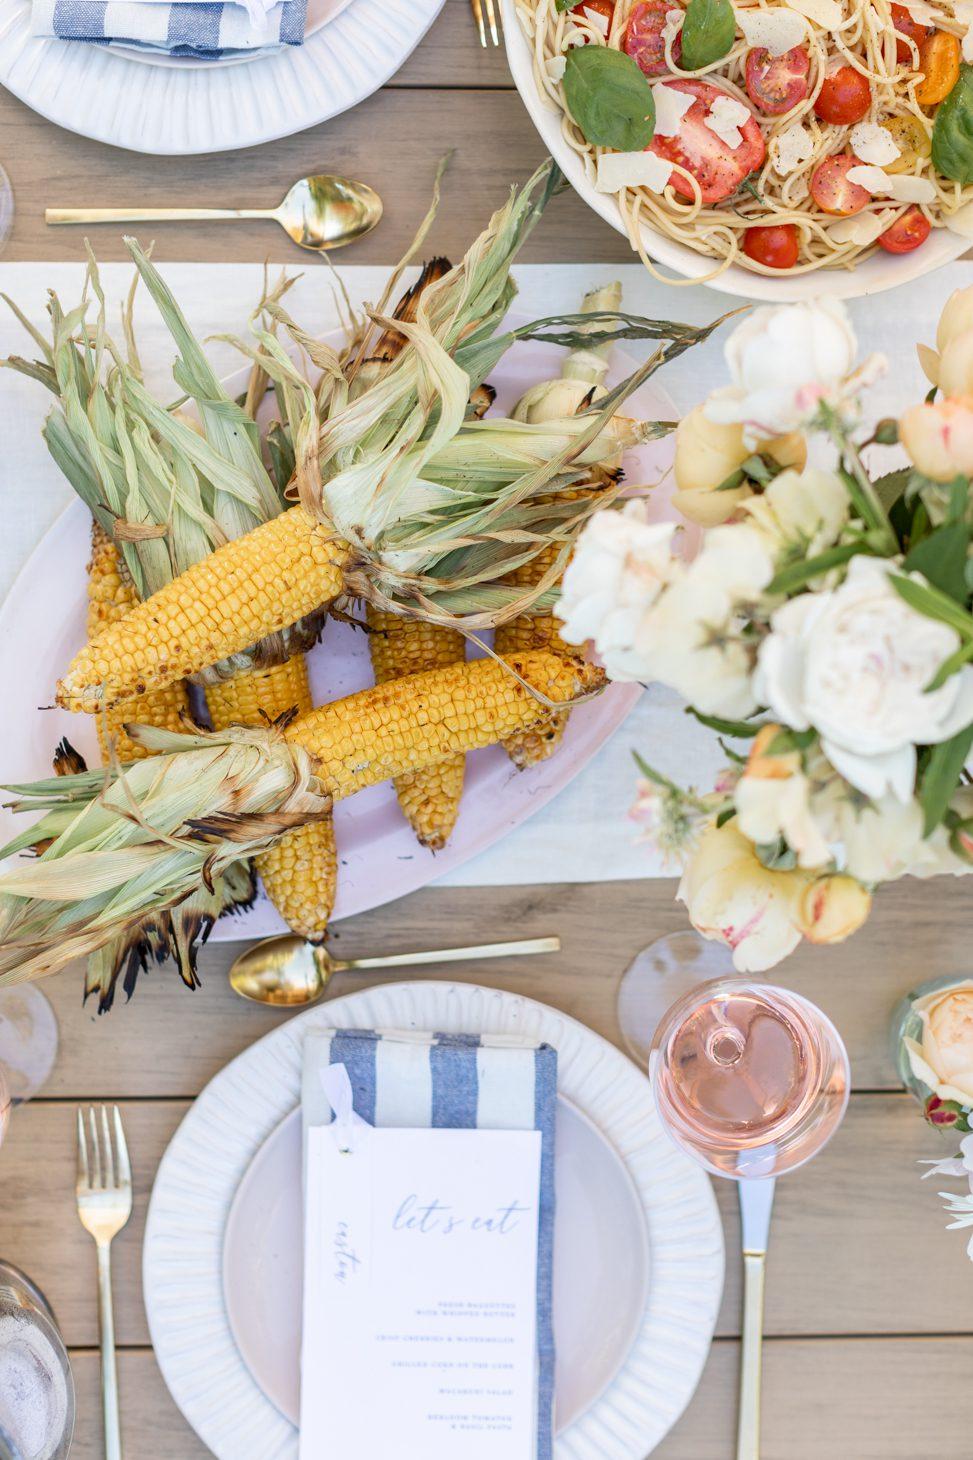 How to Make Fresh Corn on The Cob